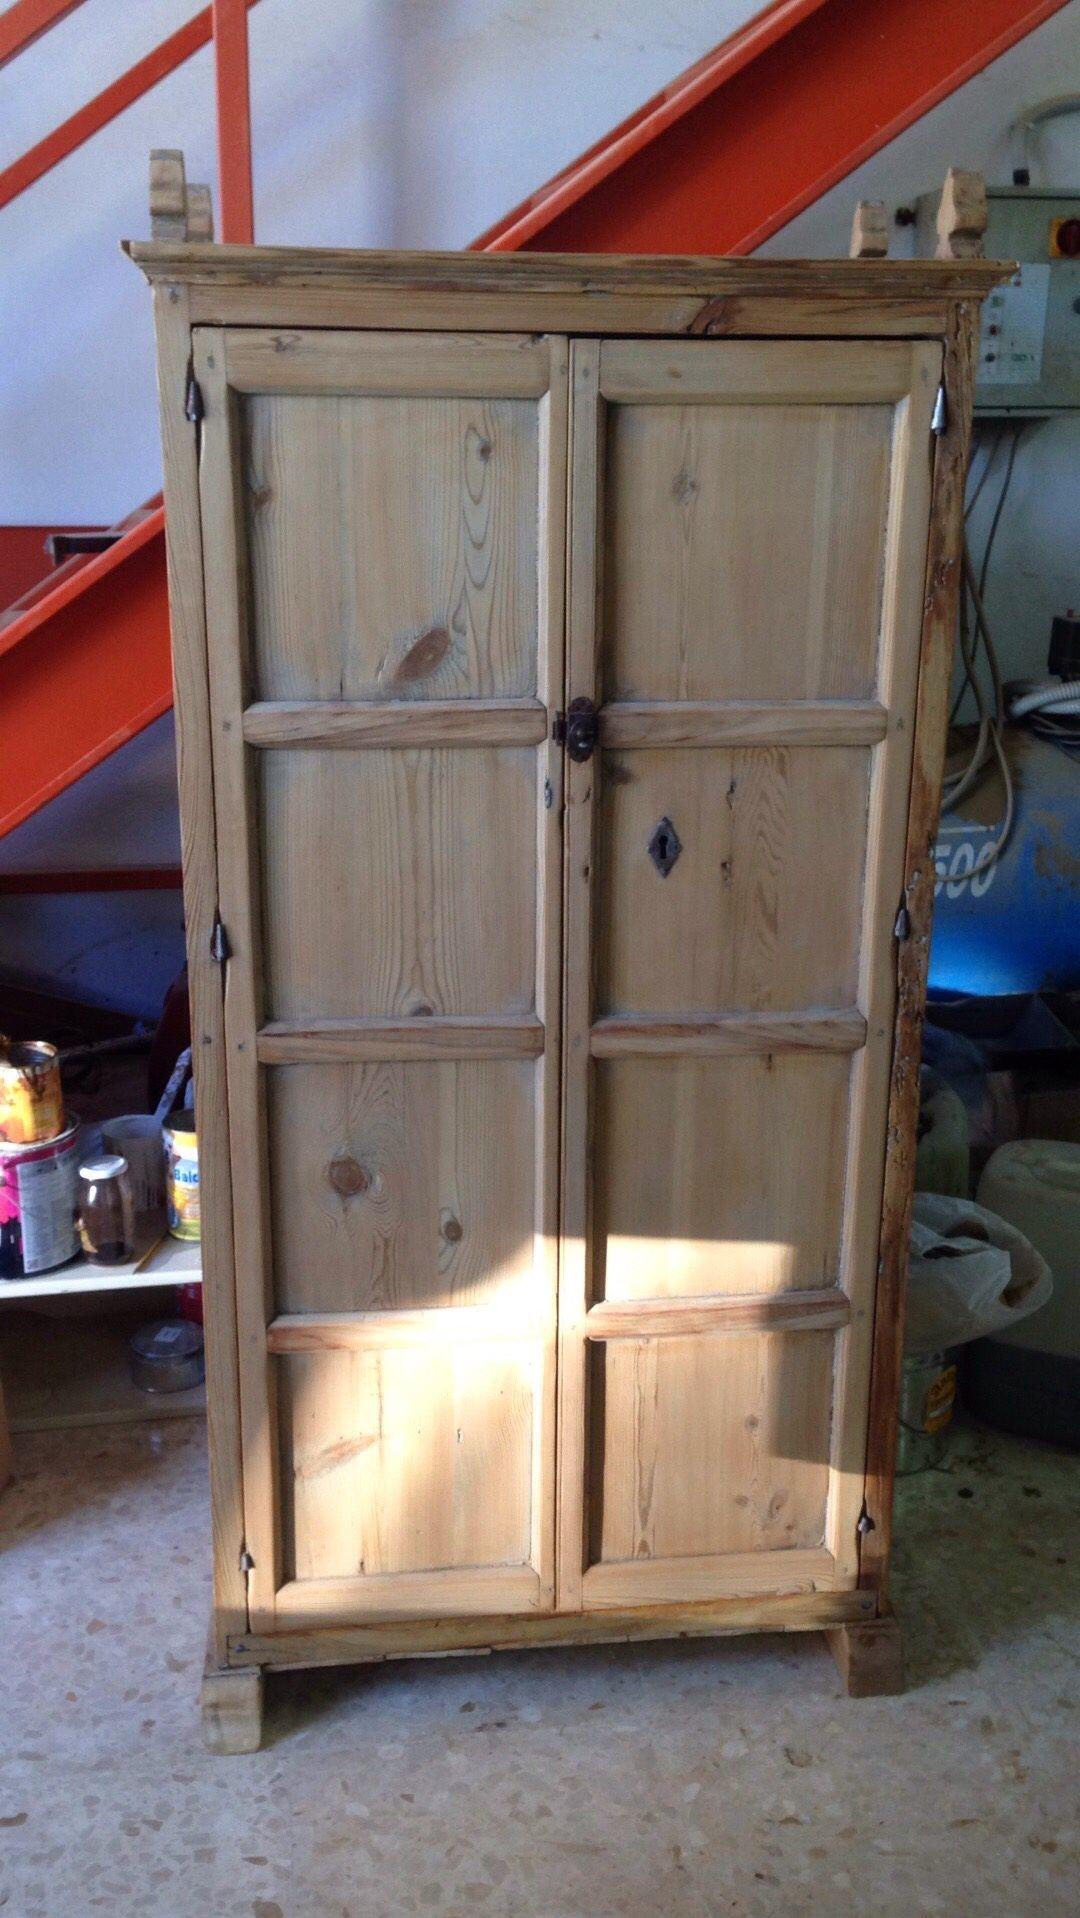 Armario espa ol antiguo de pino restaurado de carpinter a for Mueble castellano restaurado